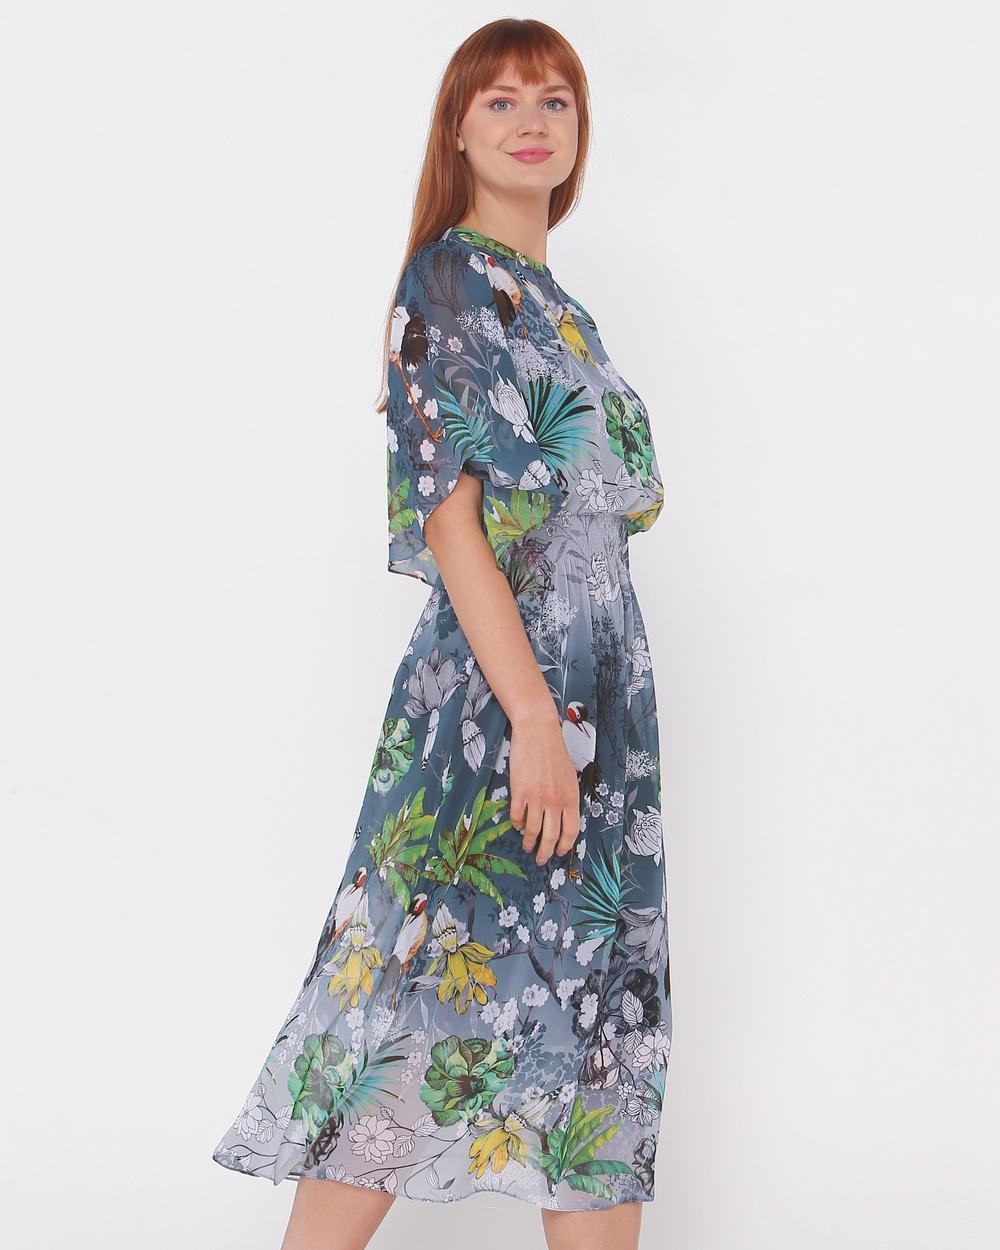 Faye Black Label - Clarissa Bell Sleeve Dress - Printed Dresses (Ocean Garden) Clarissa Bell Sleeve Dress